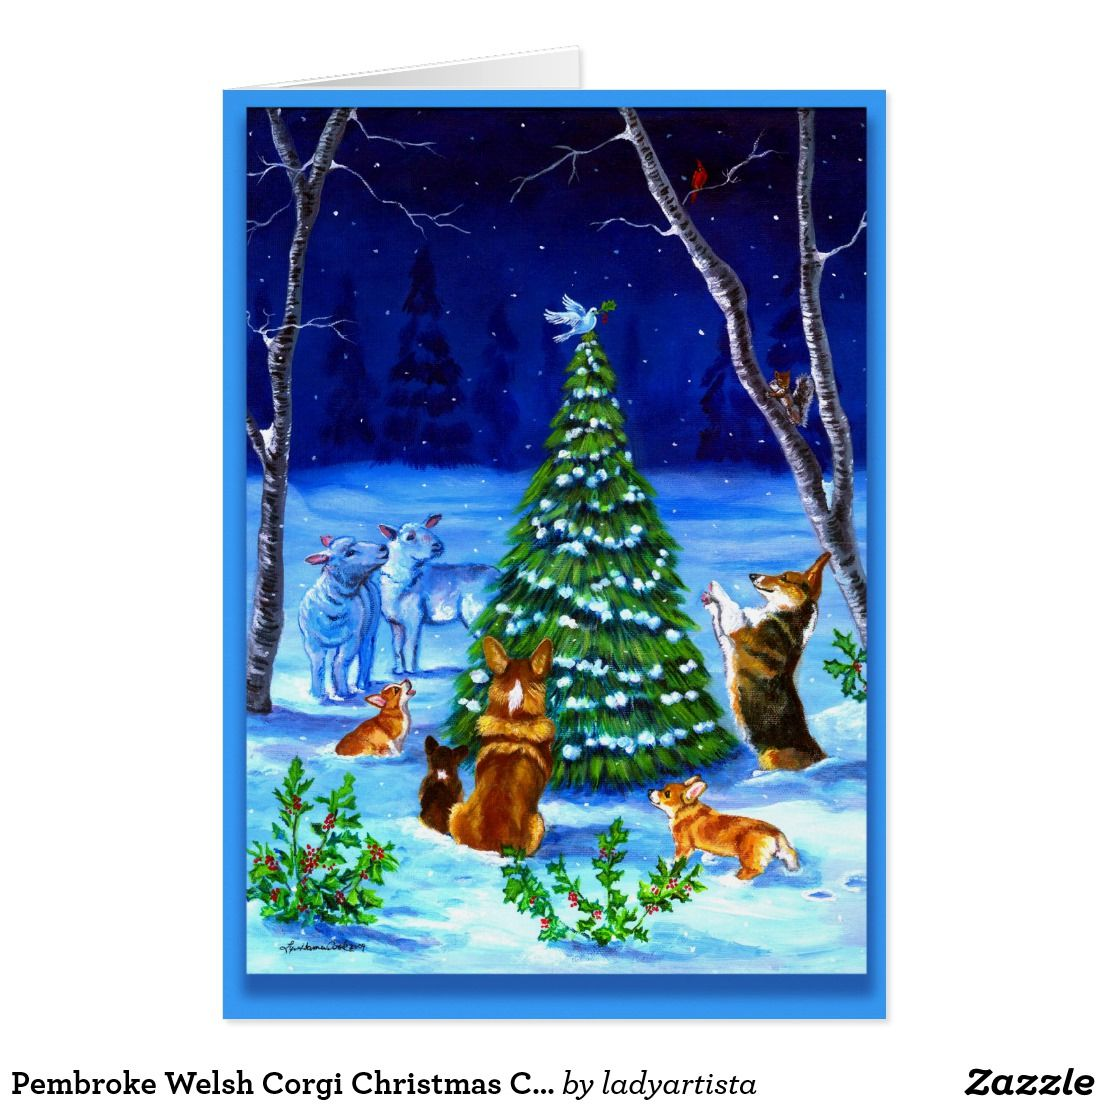 Pembroke welsh corgi christmas card custom christmas greetings pembroke welsh corgi christmas card kristyandbryce Image collections